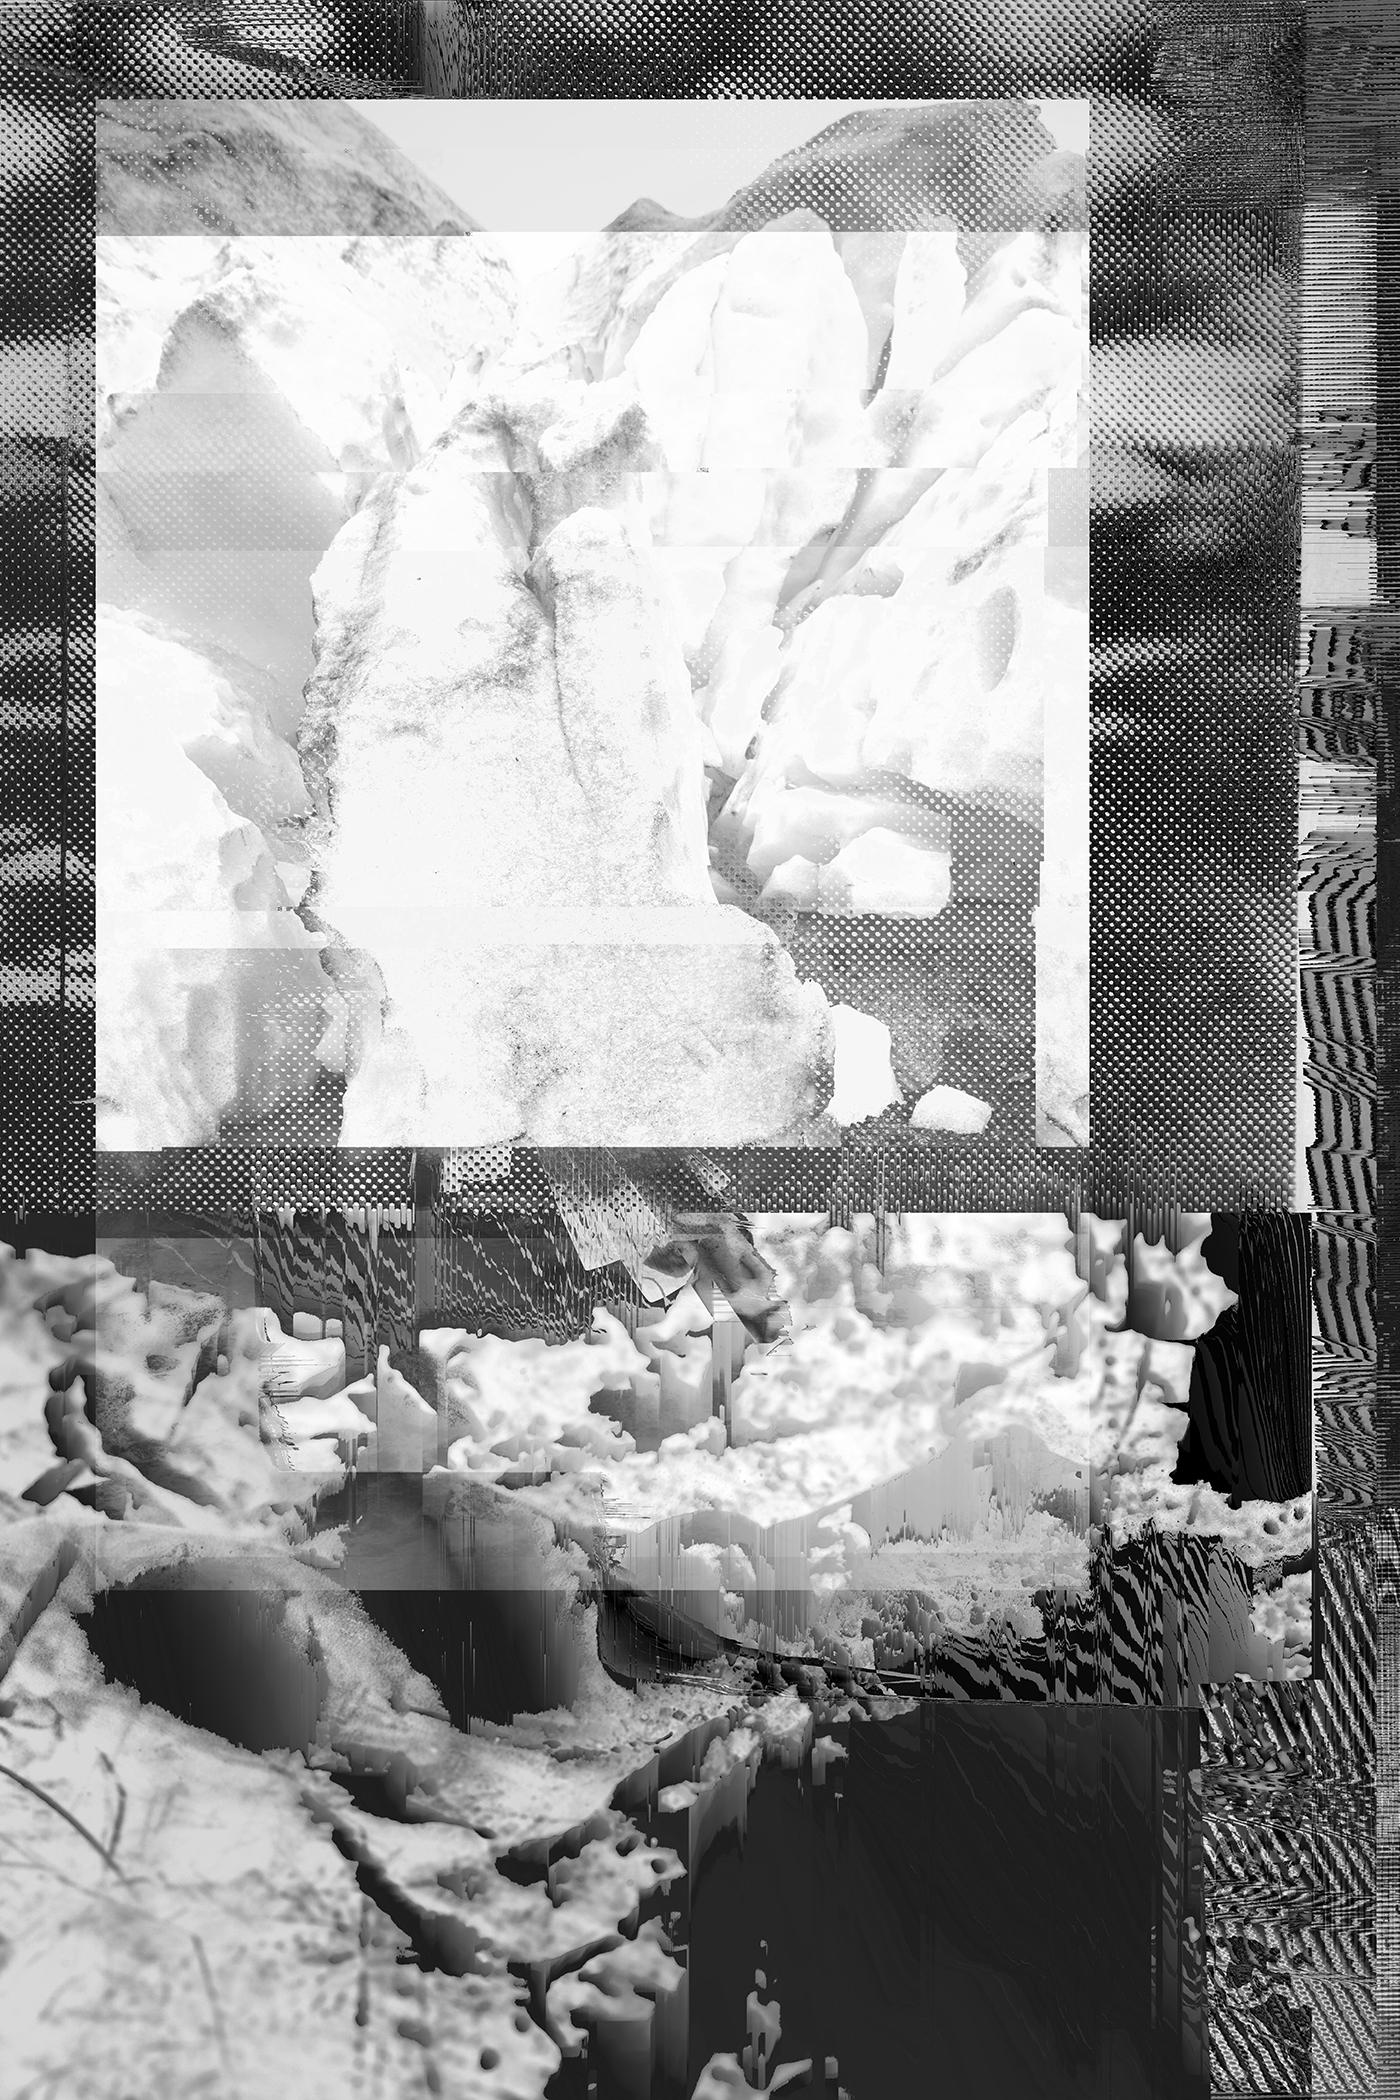 Ewa Doroszenko – Impossible Territory 14, photography